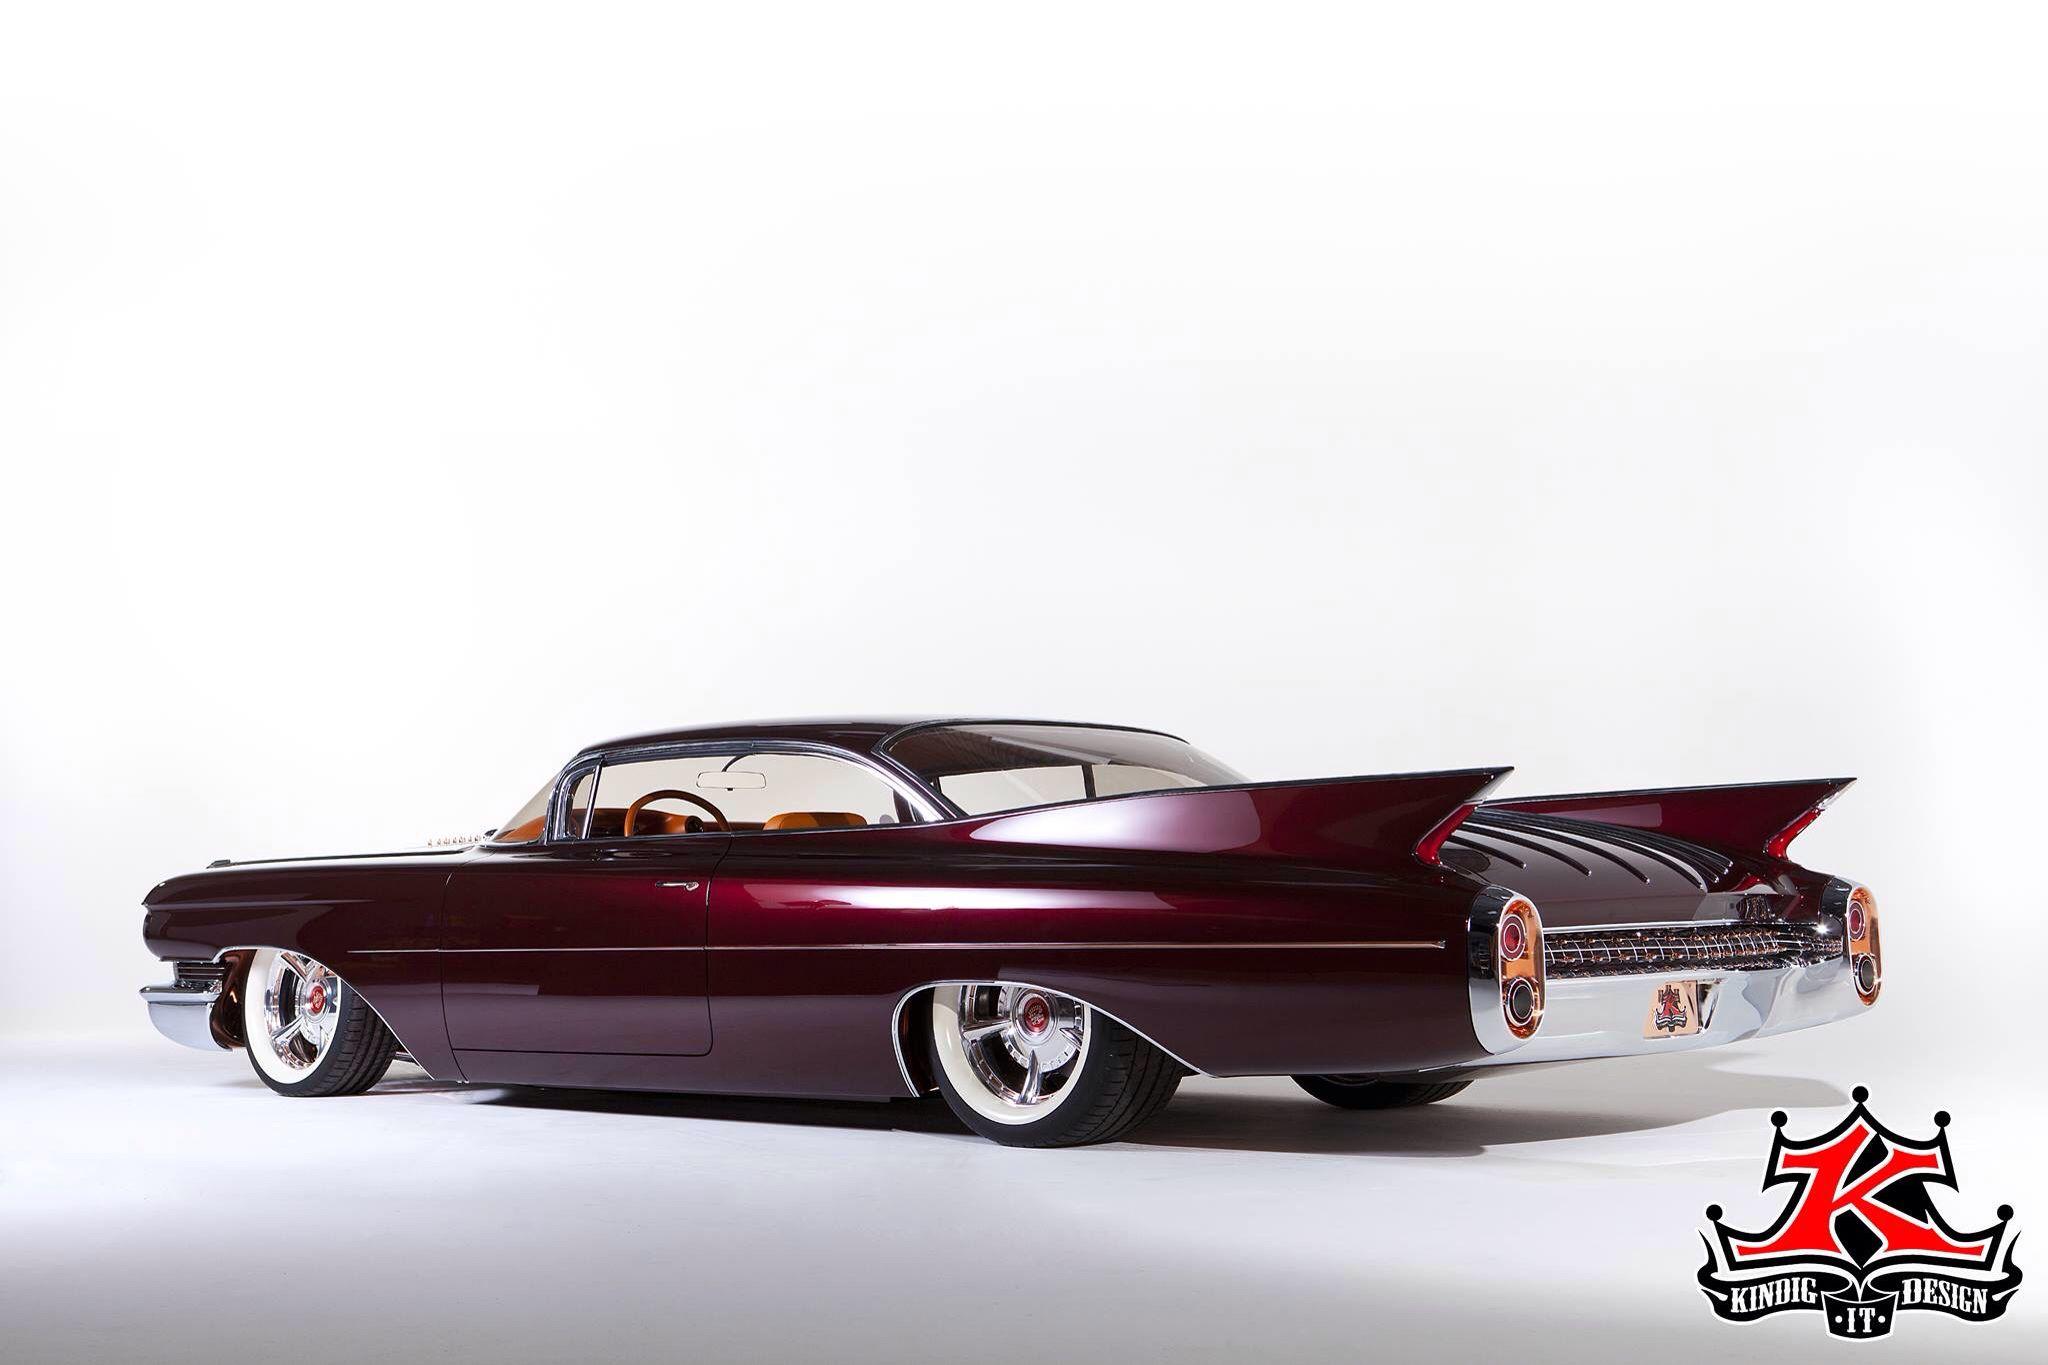 "Kindig Designs Cadillac ""HOT CADDY SLEDS"" Pinterest"